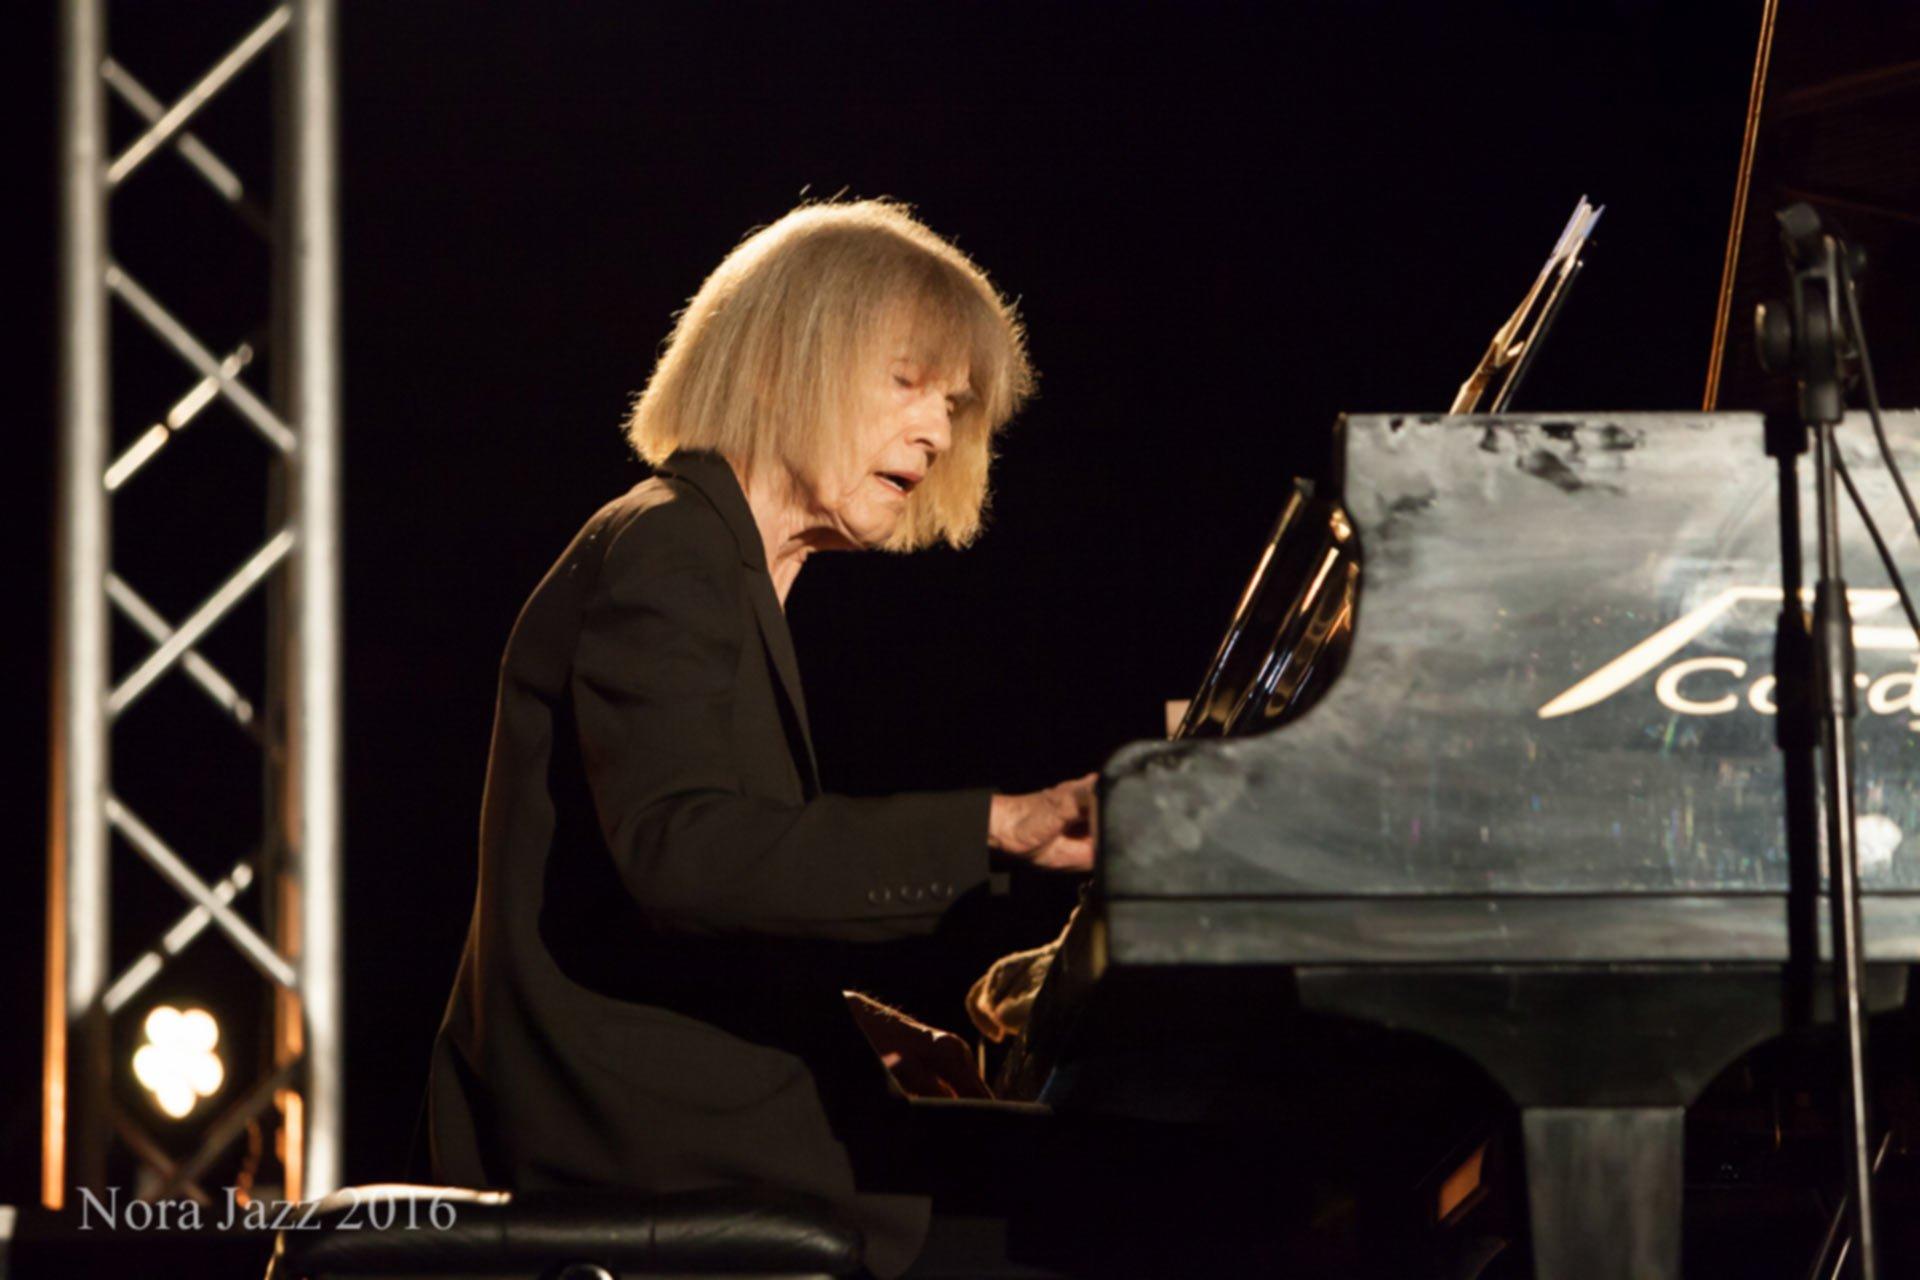 Carla Bley - Nora Jazz Festival 2016